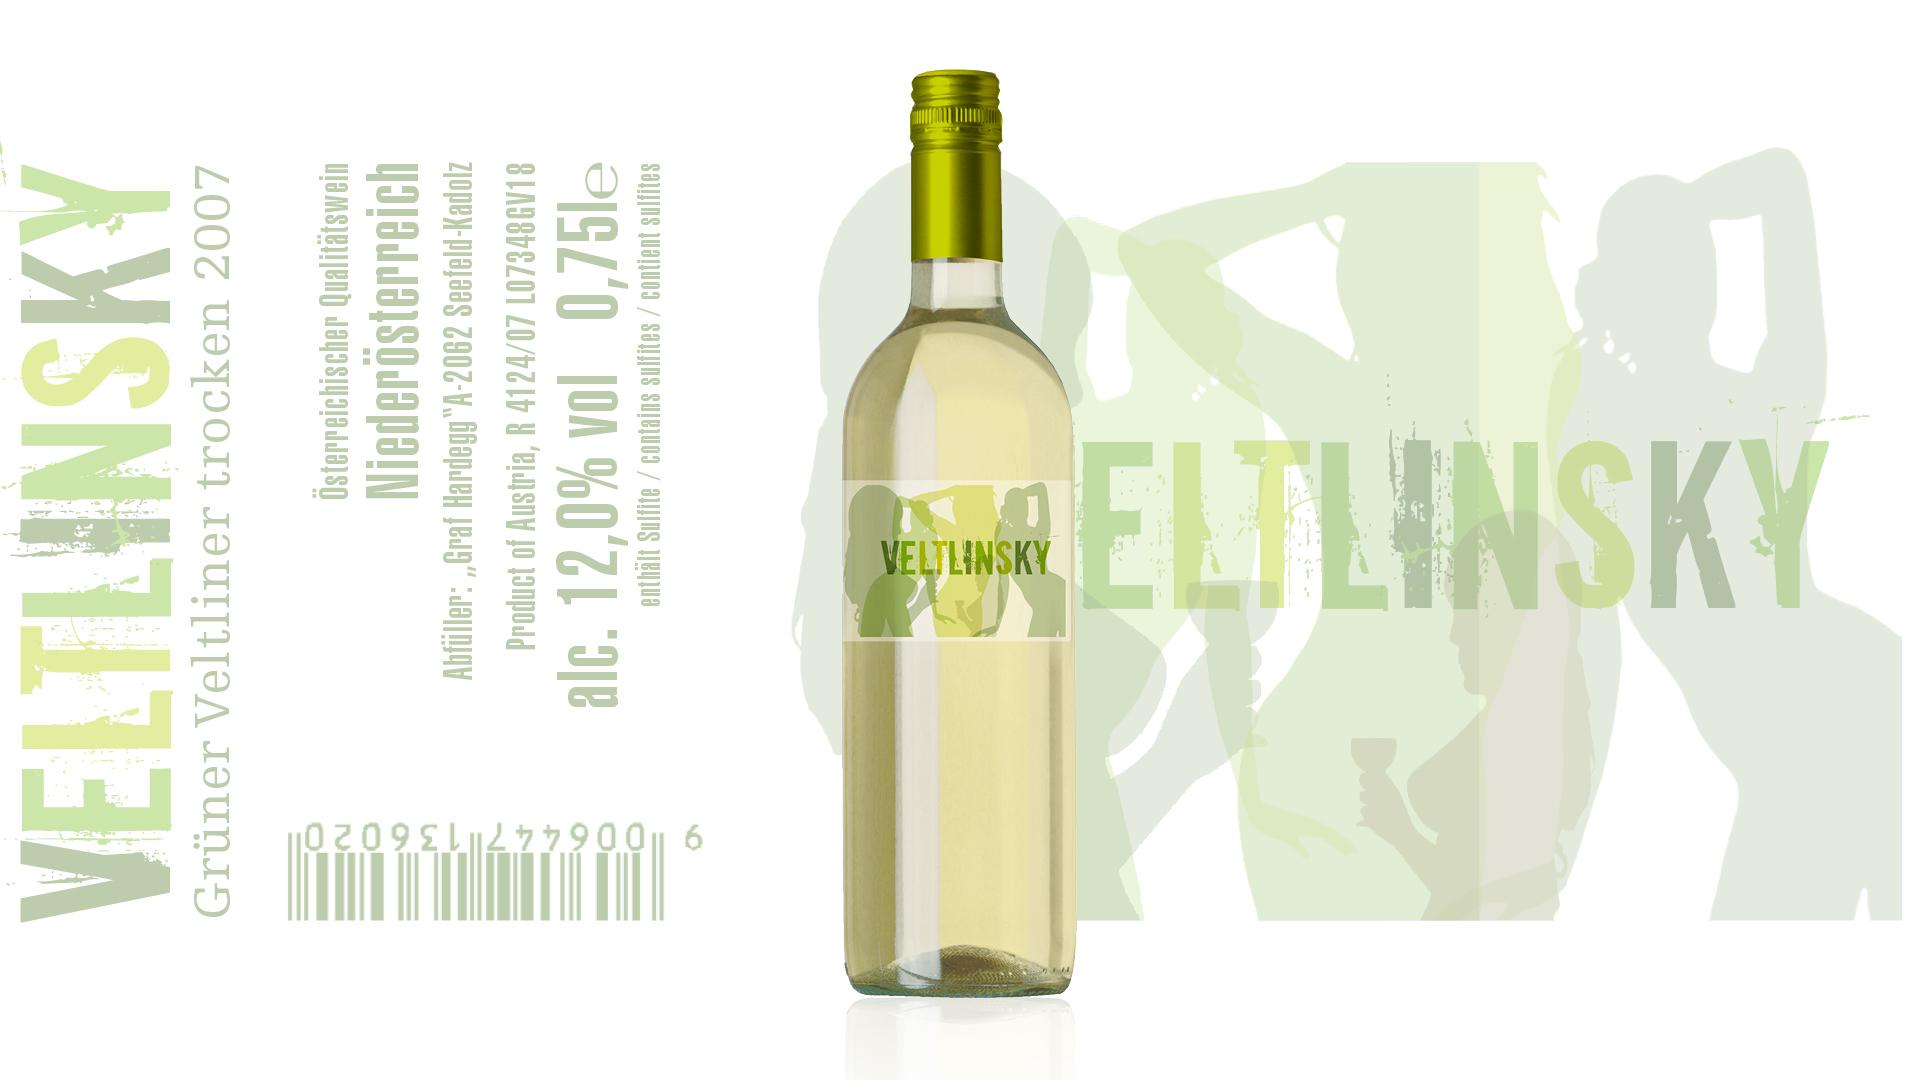 Veltlinsky Etiketten Design